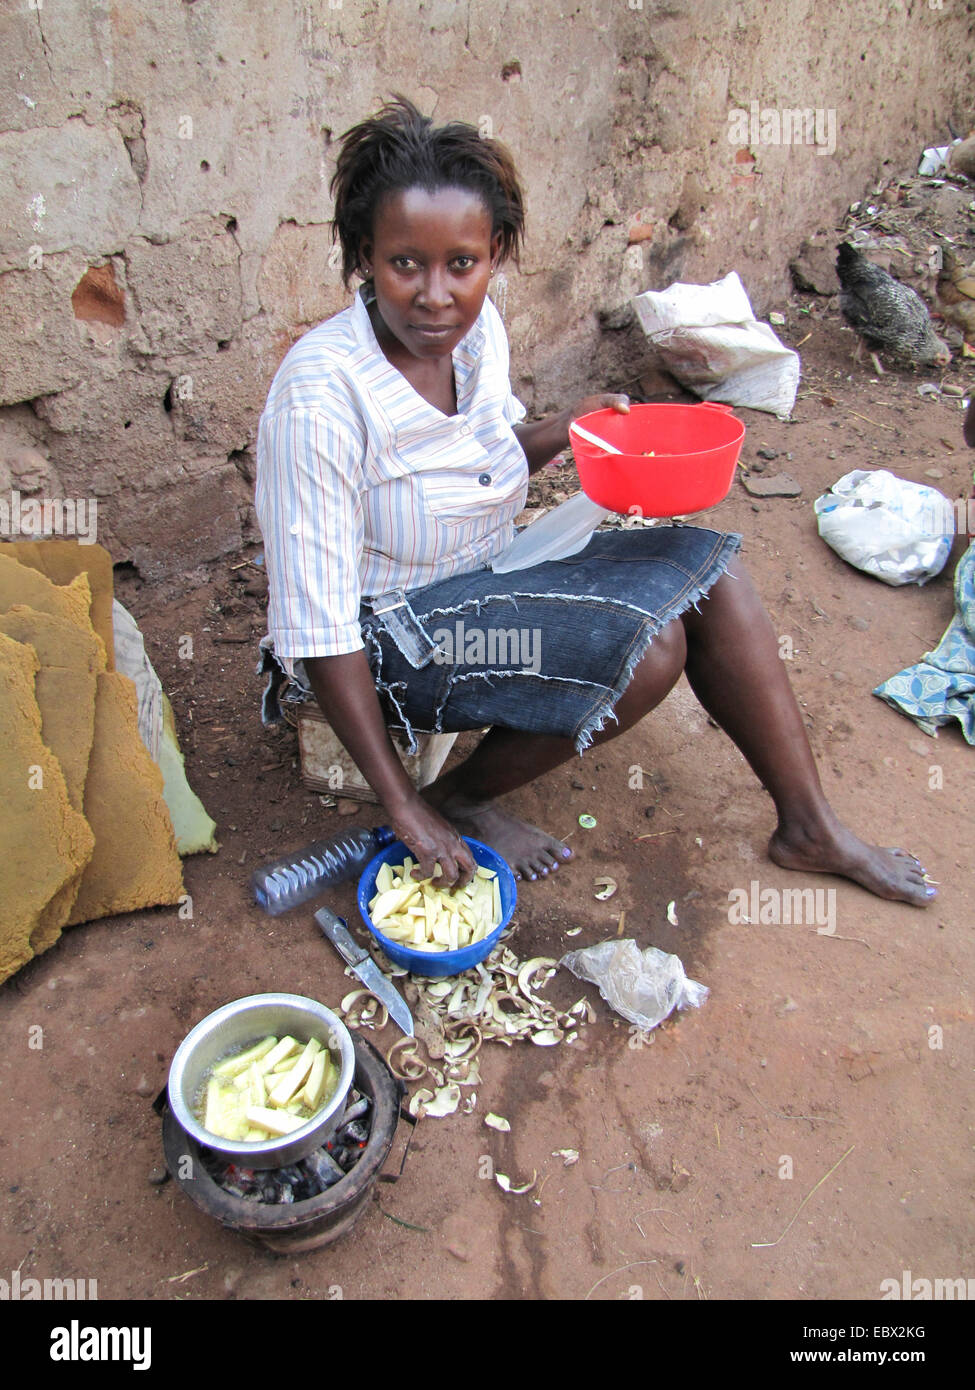 woman is frying potato chips on the soil ground of a backyard, Burundi, Bujumbura mairie, Bwiza, Bujumbura - Stock Image